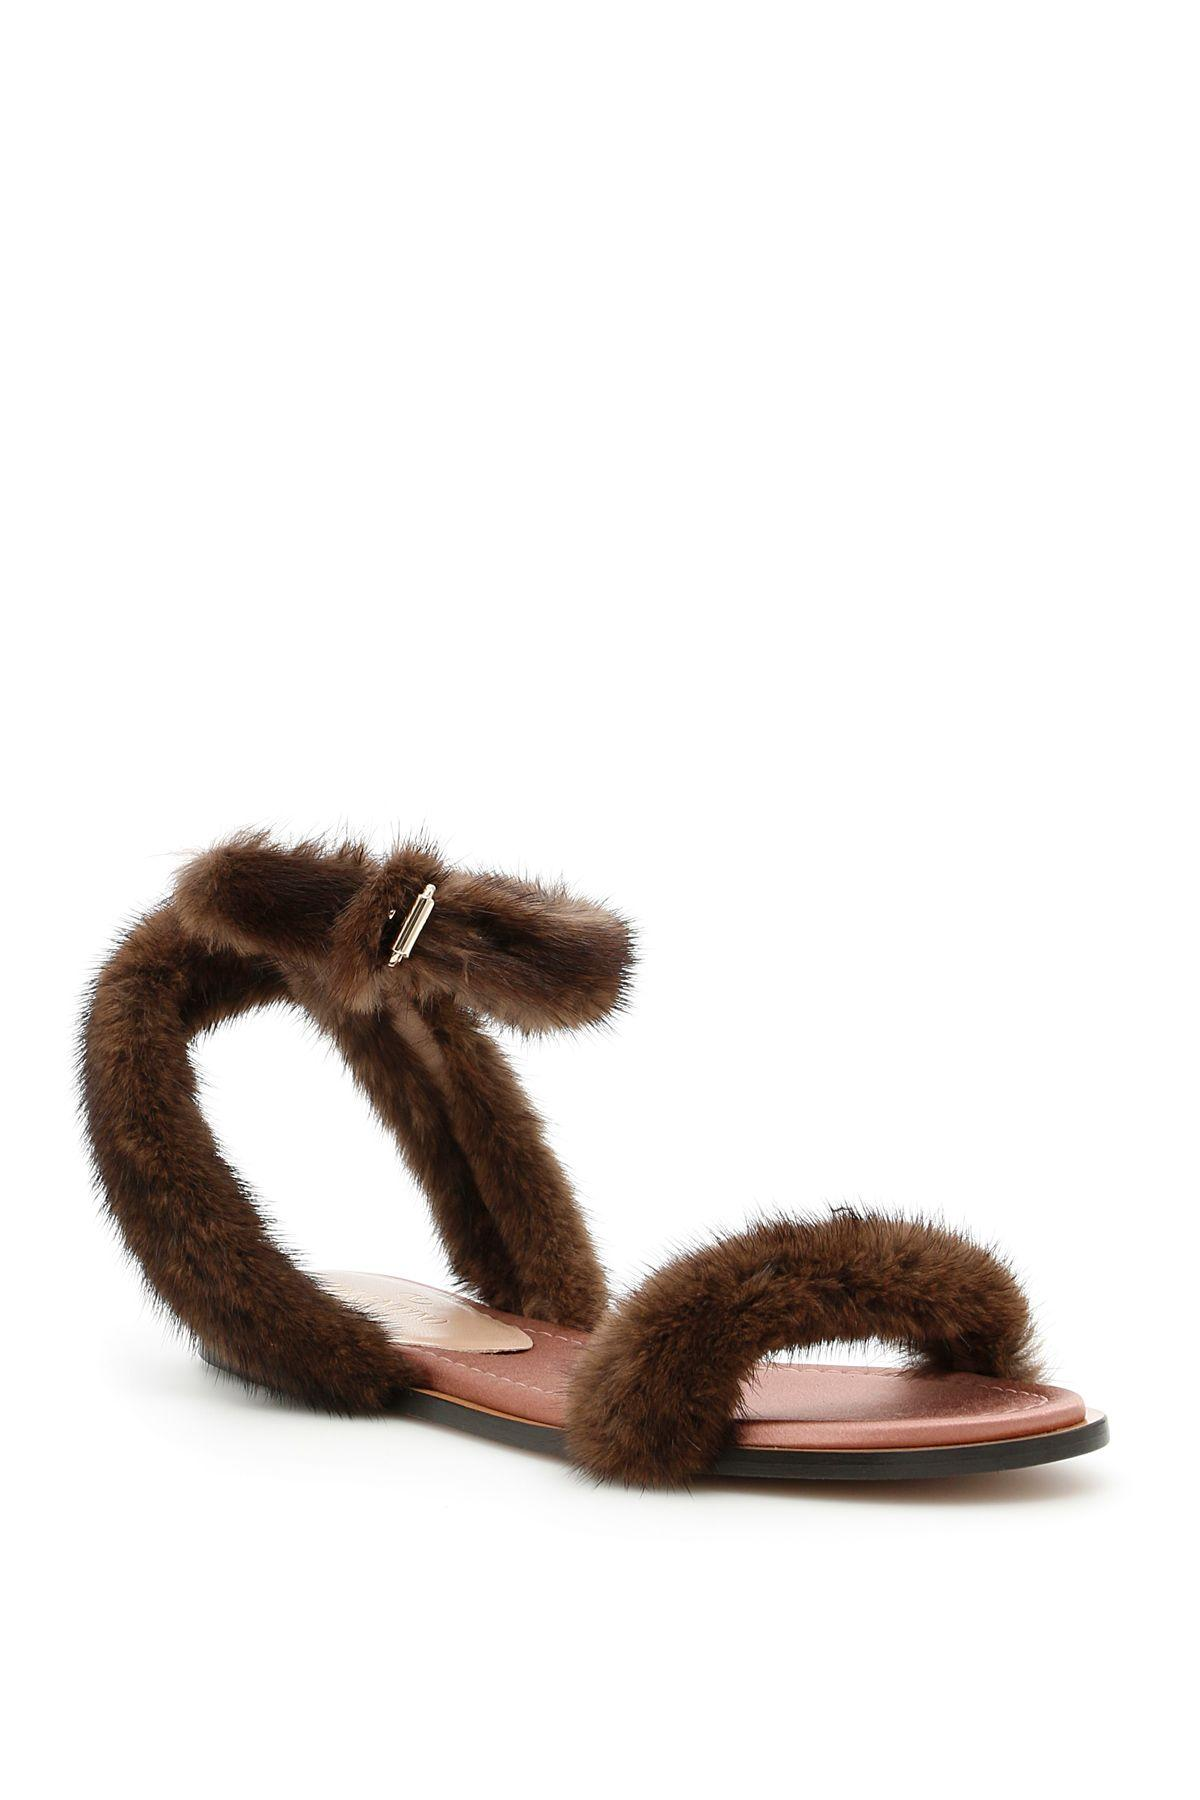 a951e39e628a Valentino Mink Fur Sandals In Visone Lipstick